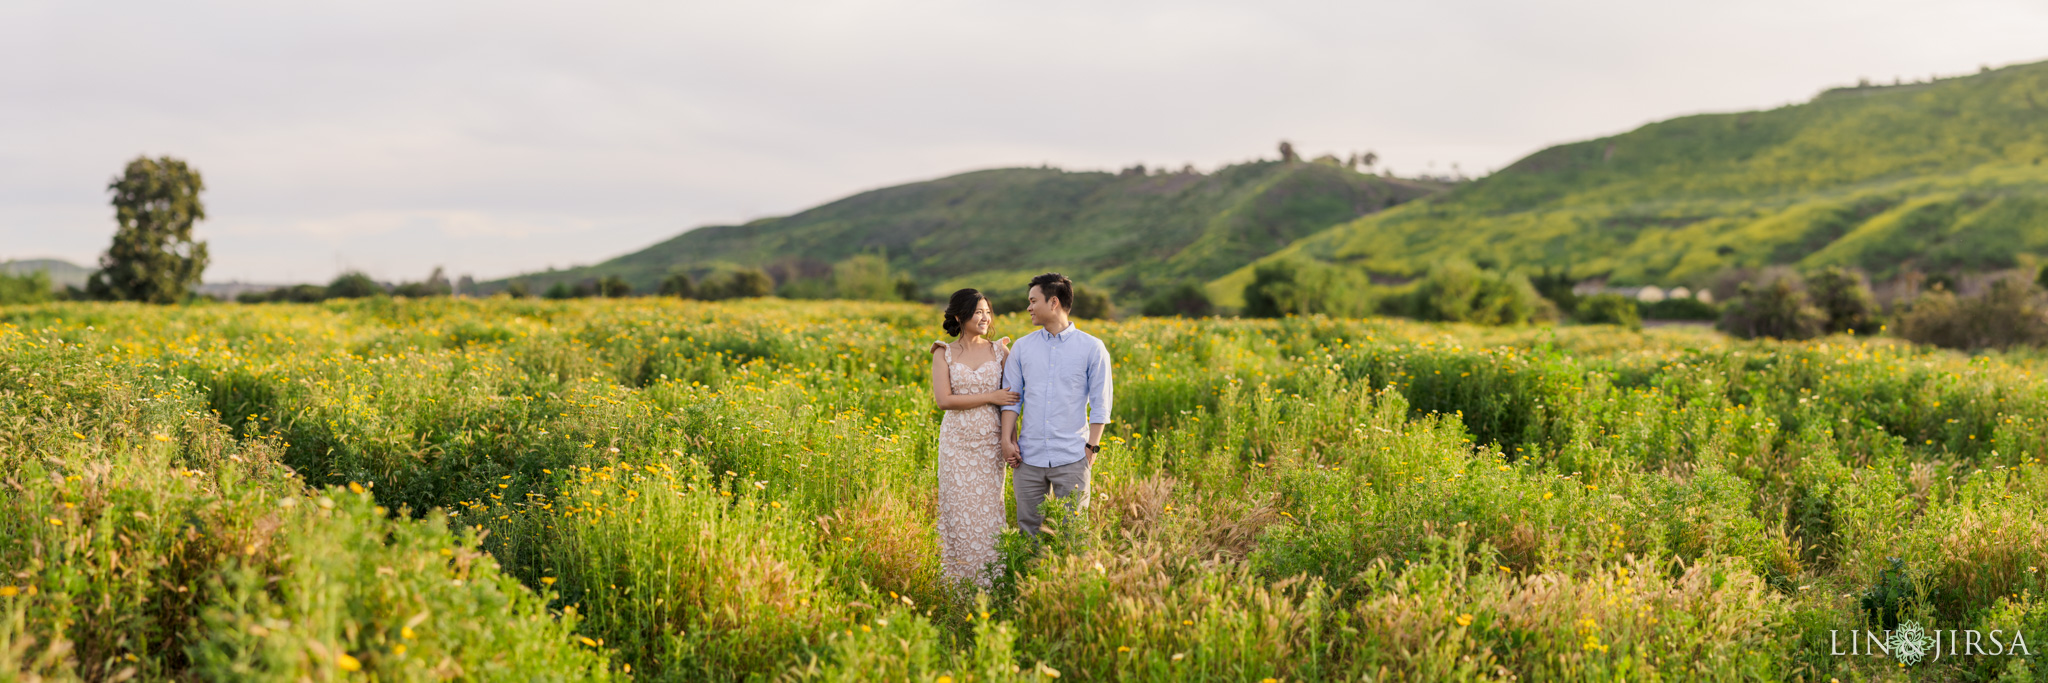 15 Northwest Open Space Orange County Engagement Photography